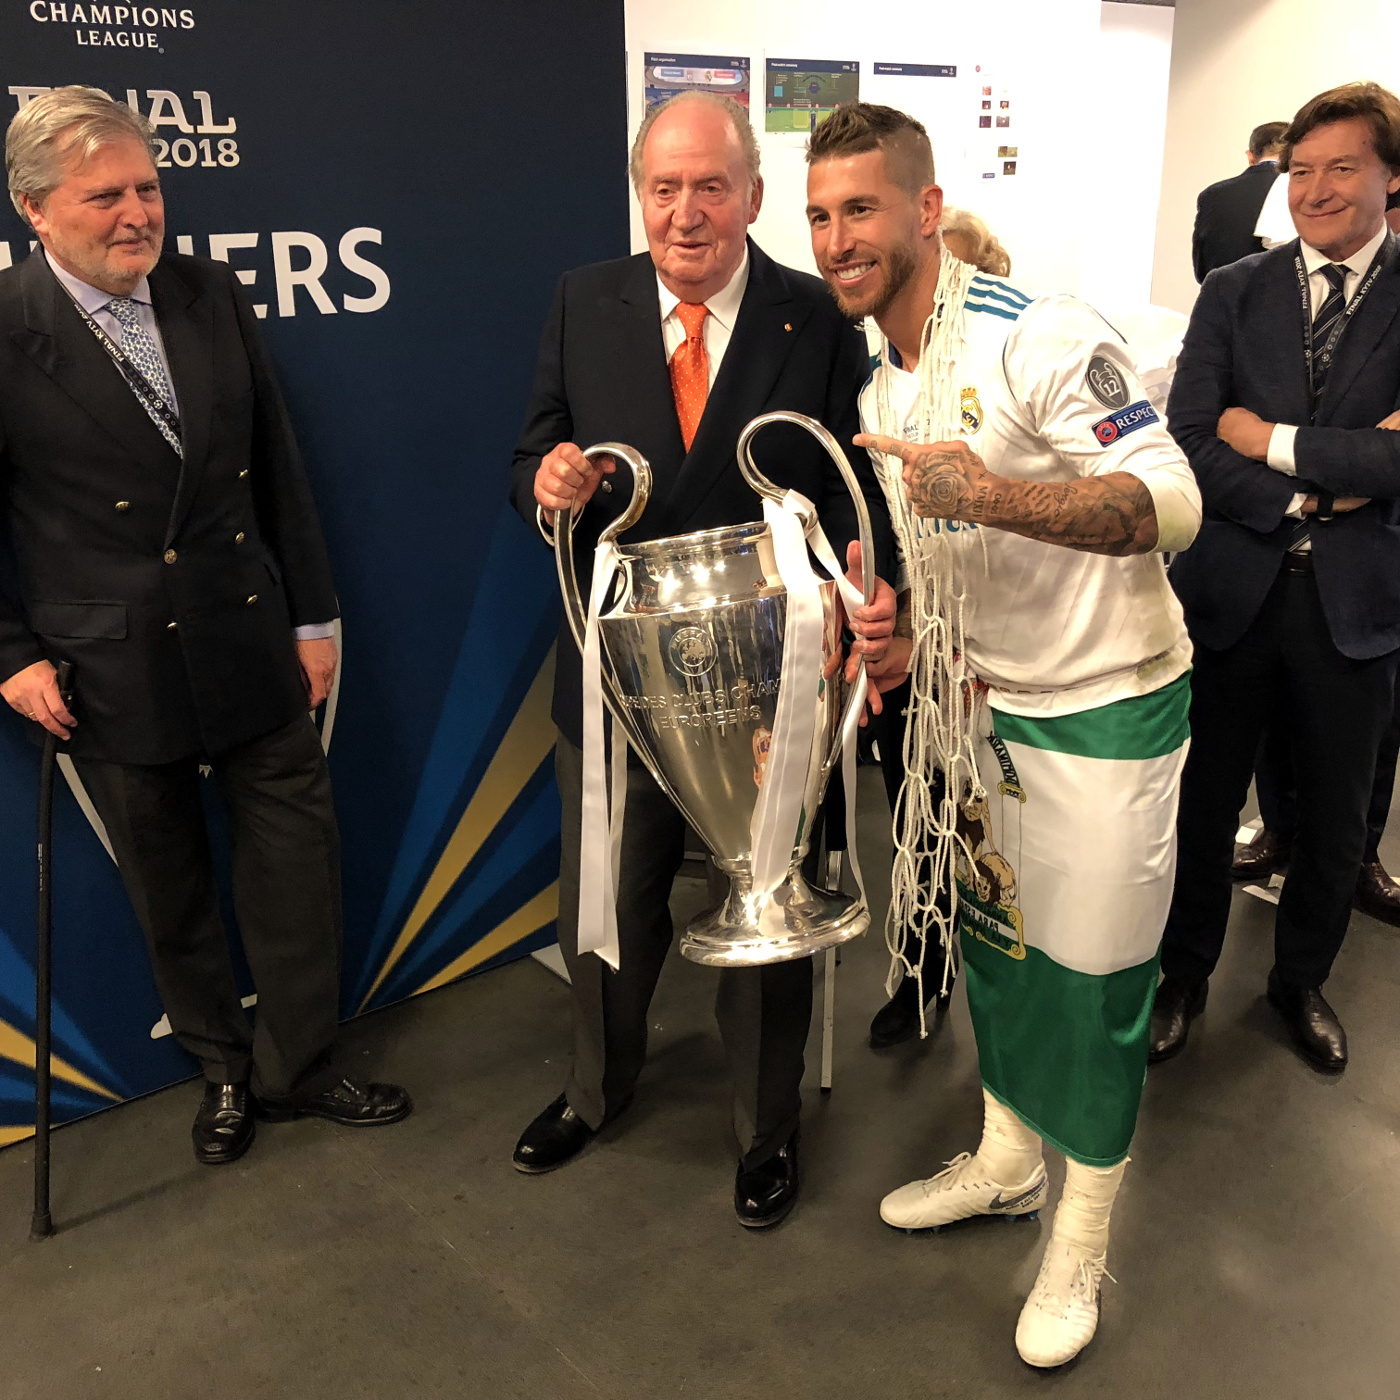 rey_final_champions_league_20180526_07